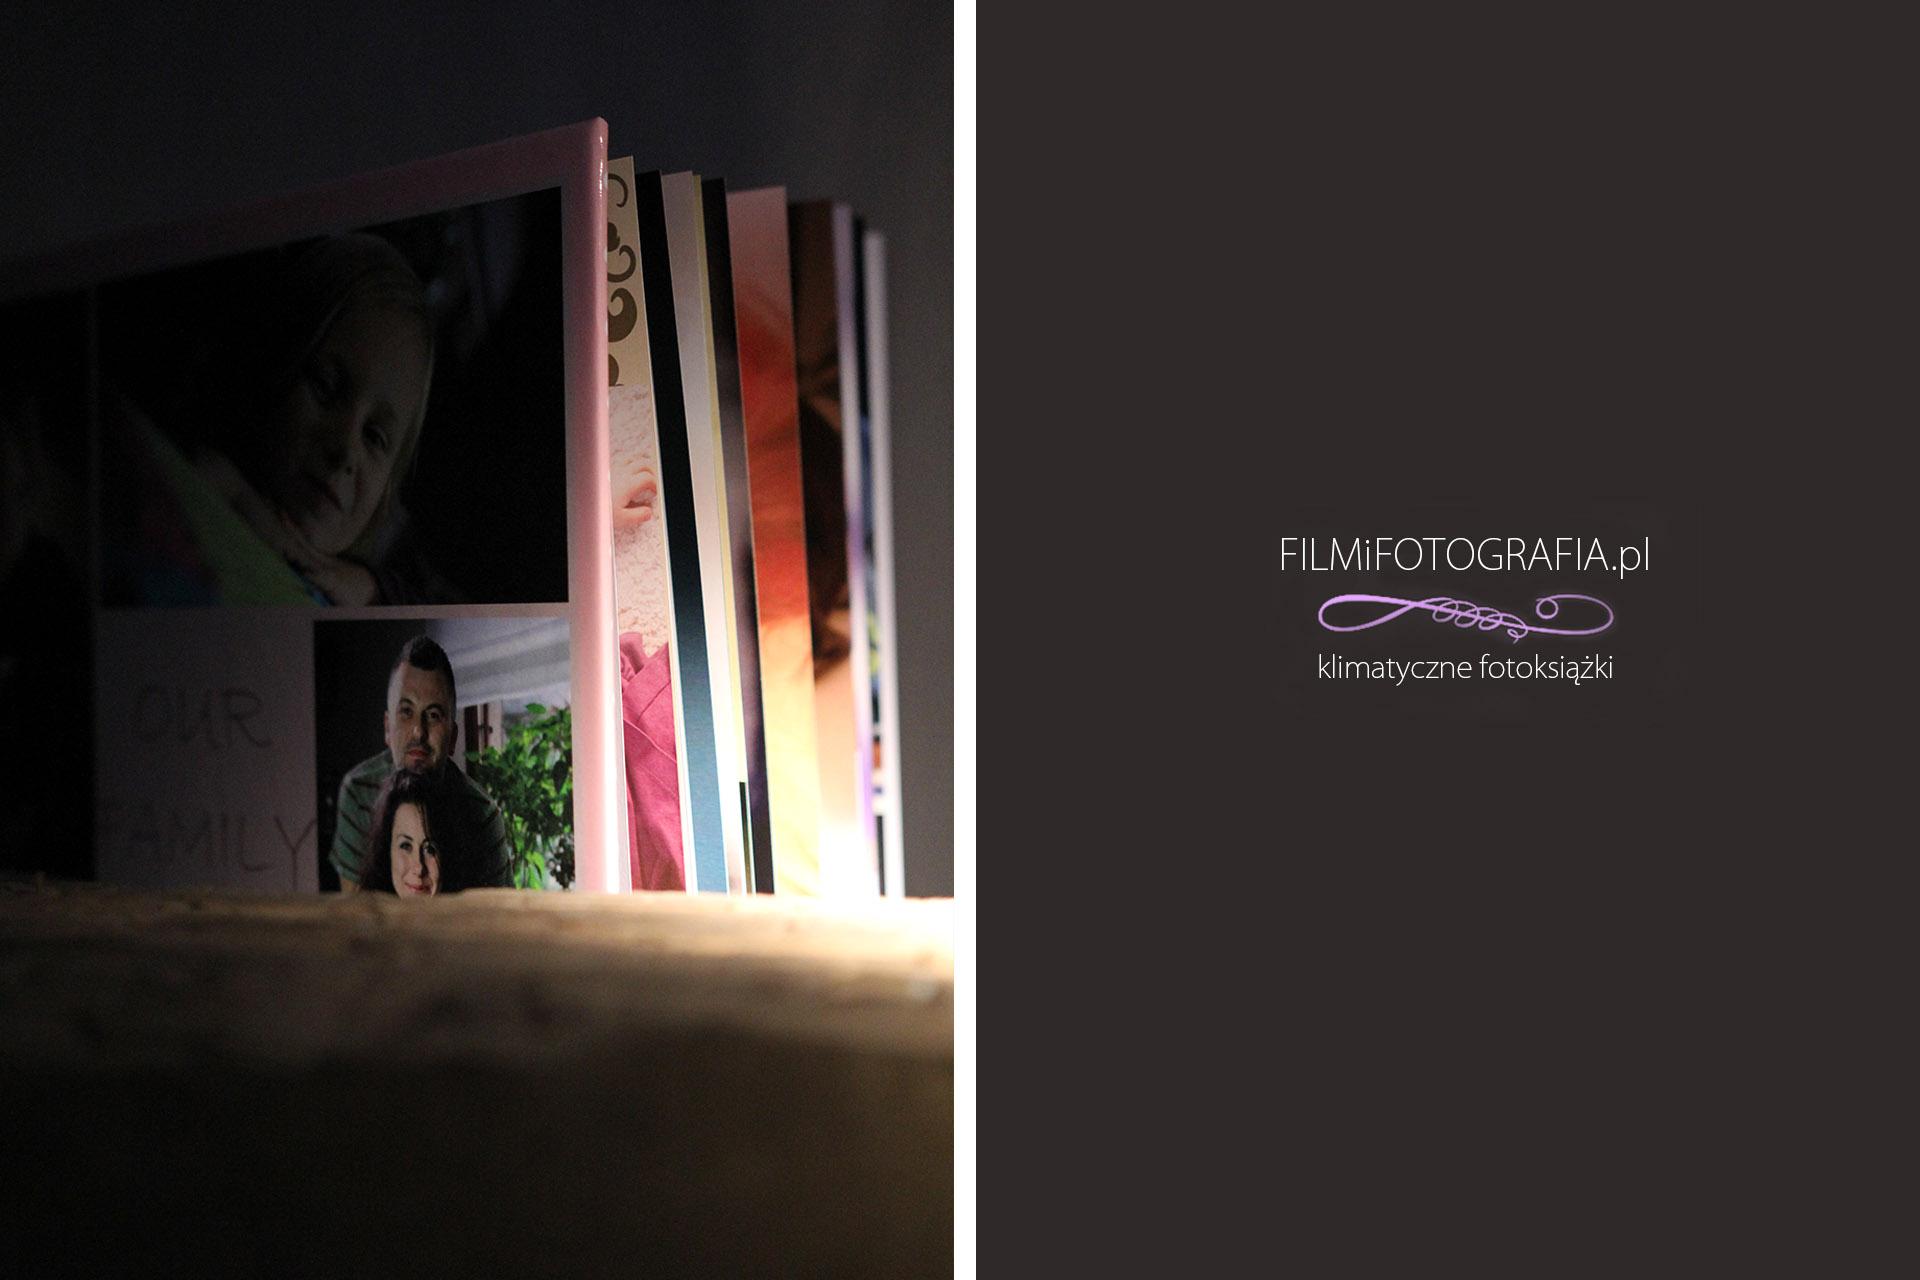 filmifotografia.pl, fotoksiążki